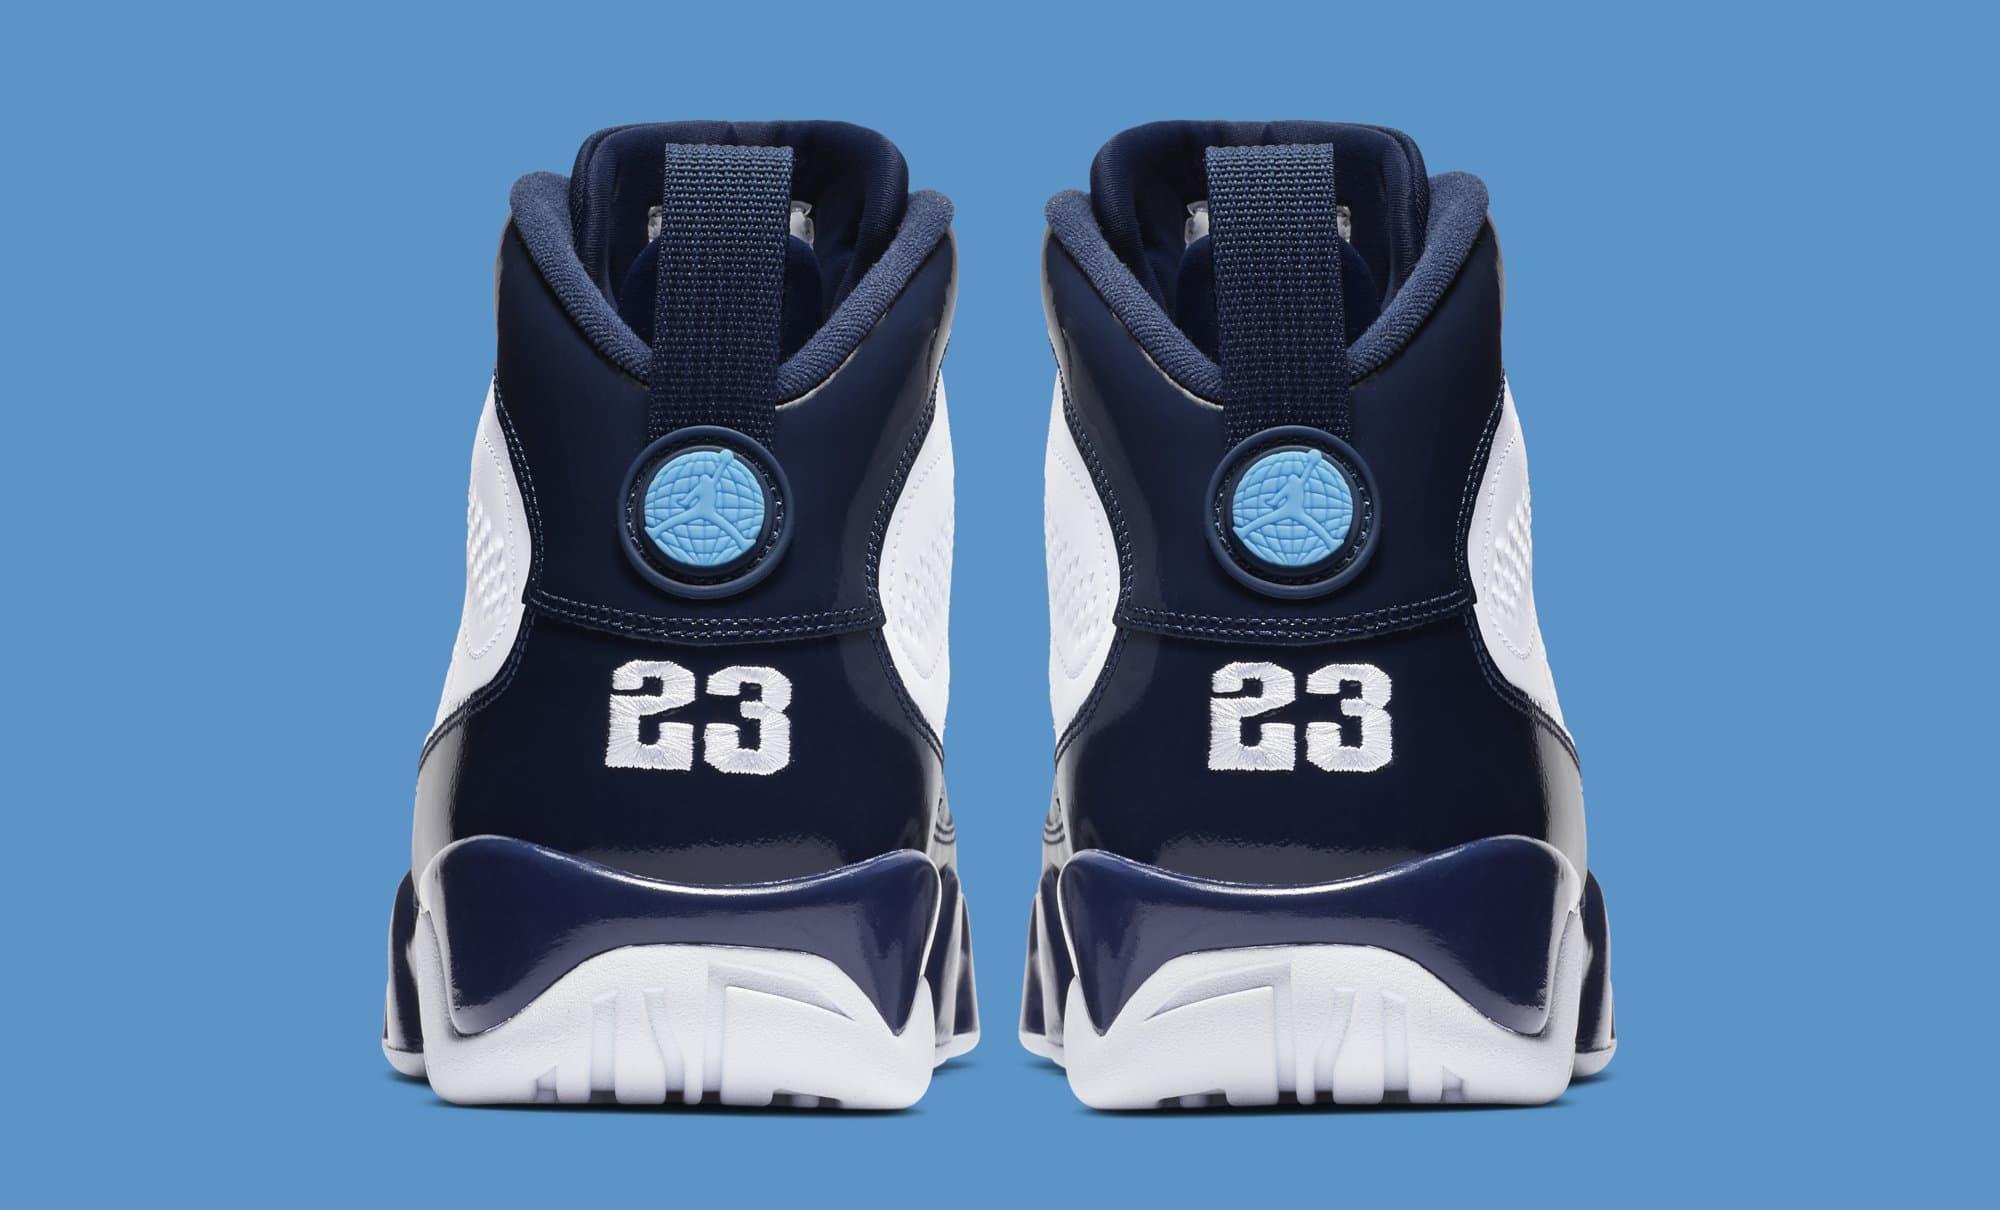 new style a8e86 1a4ea Air Jordan 9 IX All-Star 2019 Release Date 302370-145   Sole Collector